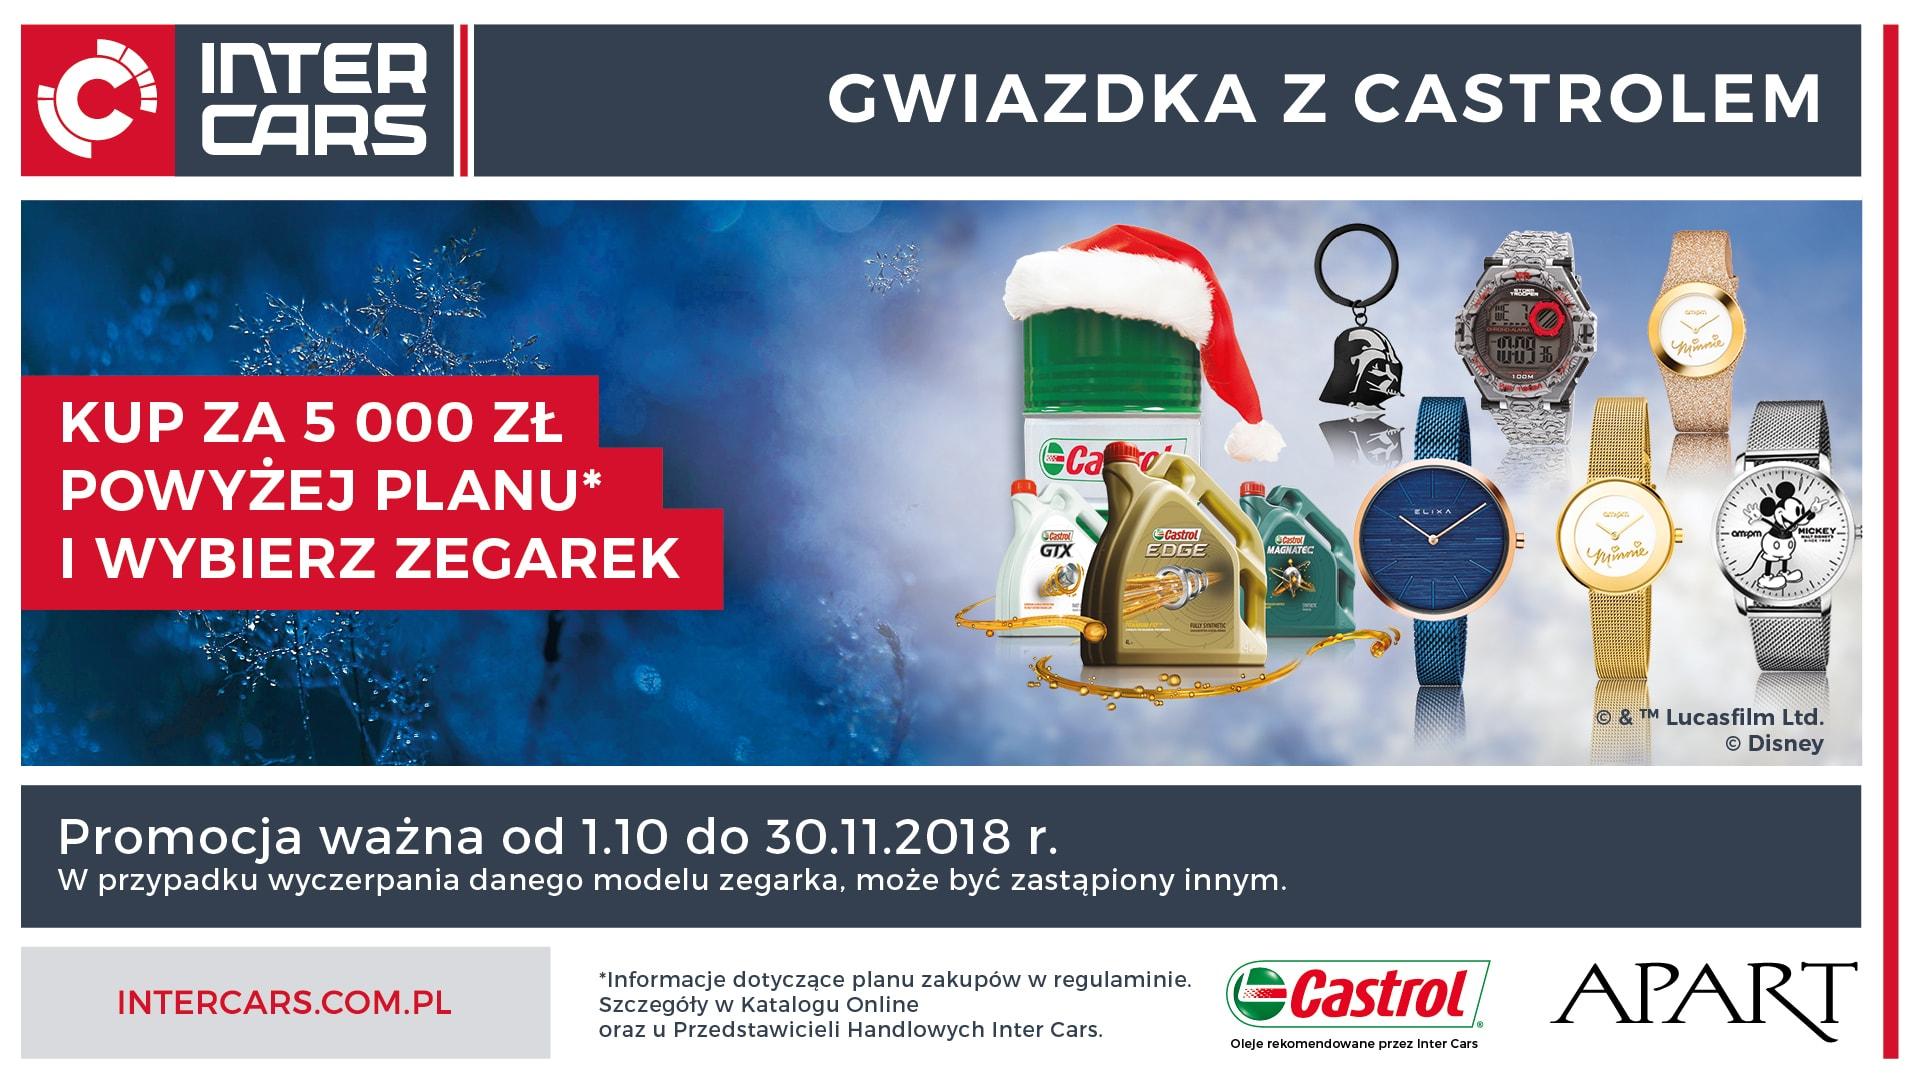 castrol_zrealizuj_plan_5000_zegarek_1920x1080.jpg